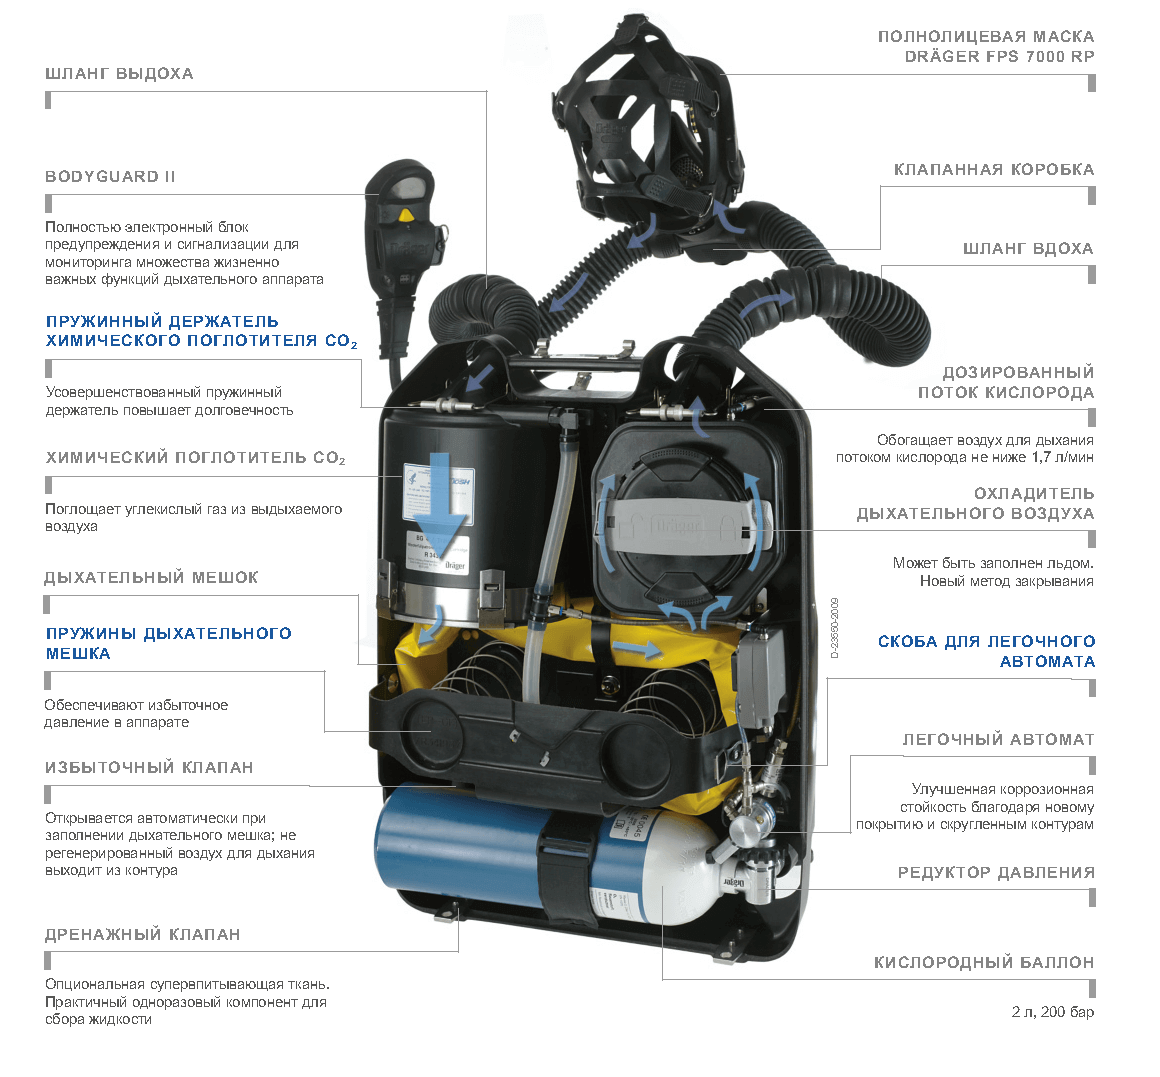 Дыхательный аппарат PSS BG4 PIUS